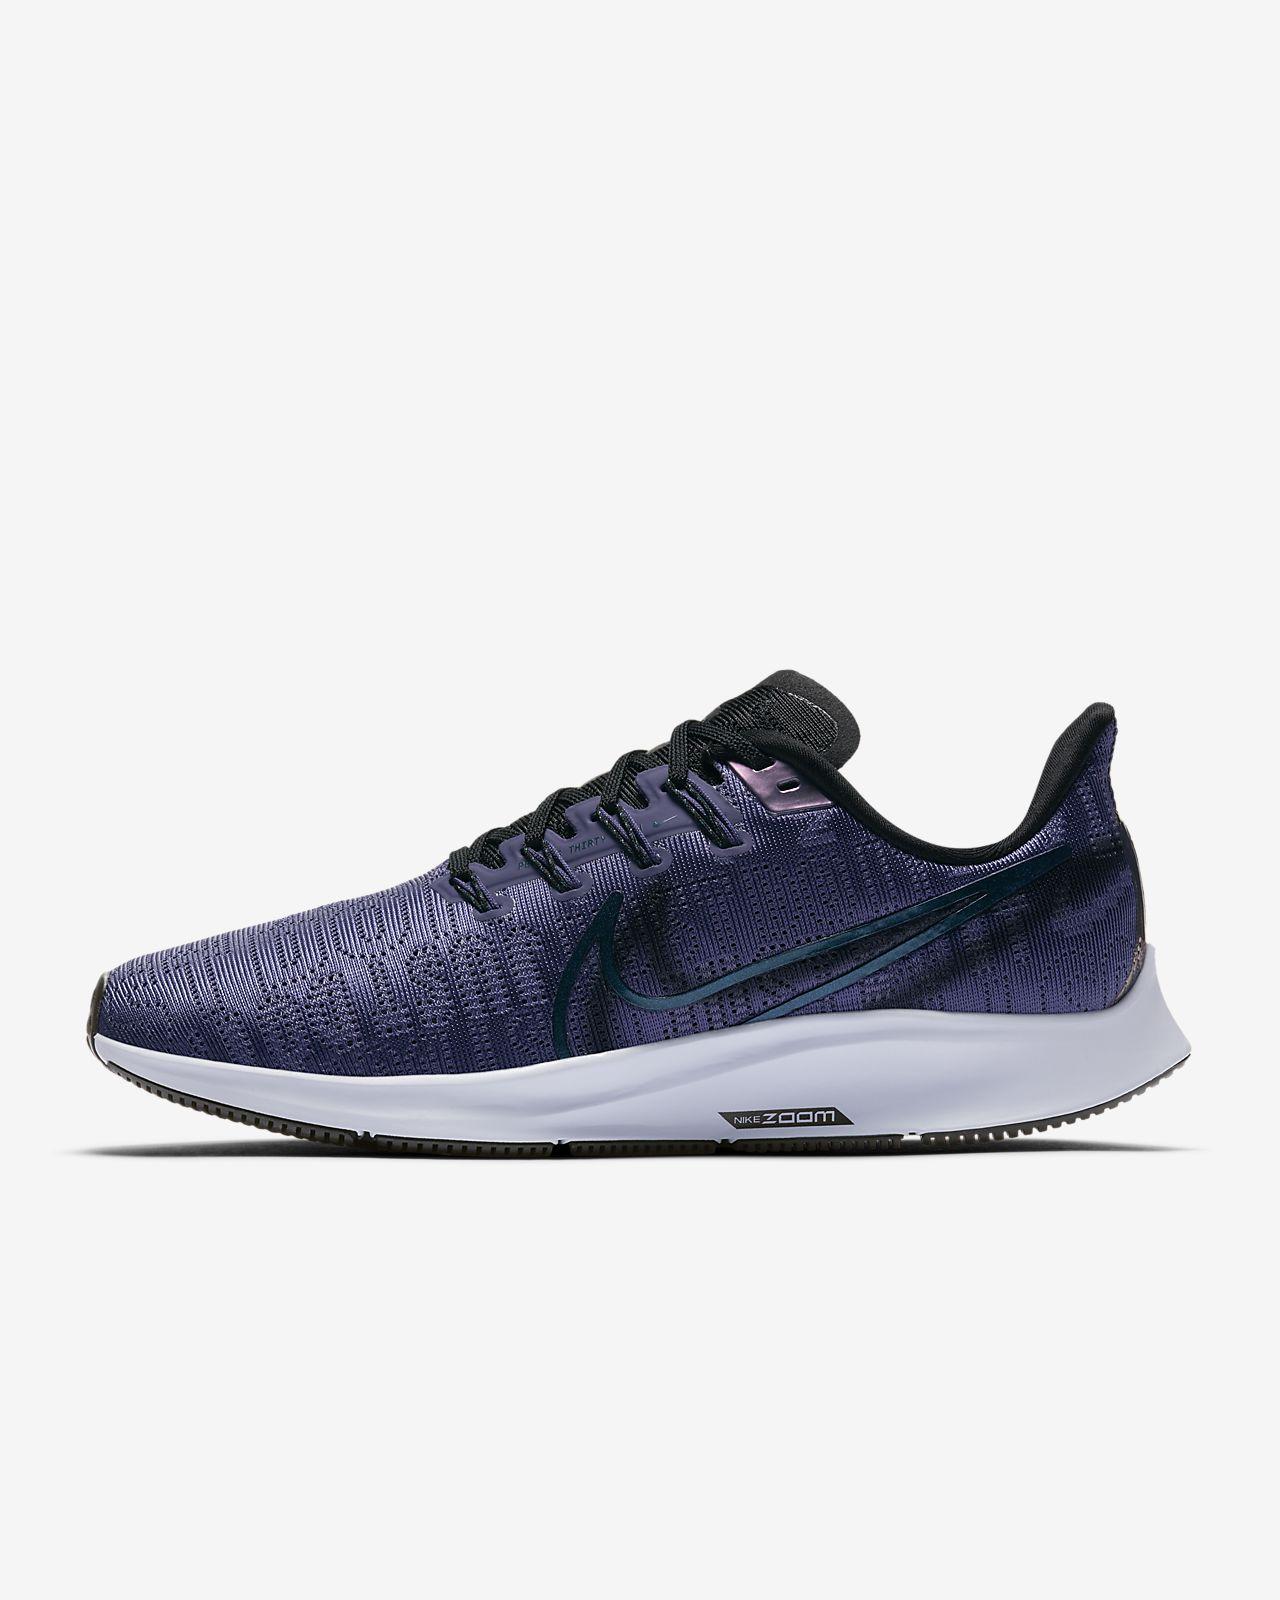 Damskie buty do biegania Nike Air Zoom Pegasus 36 Premium Rise